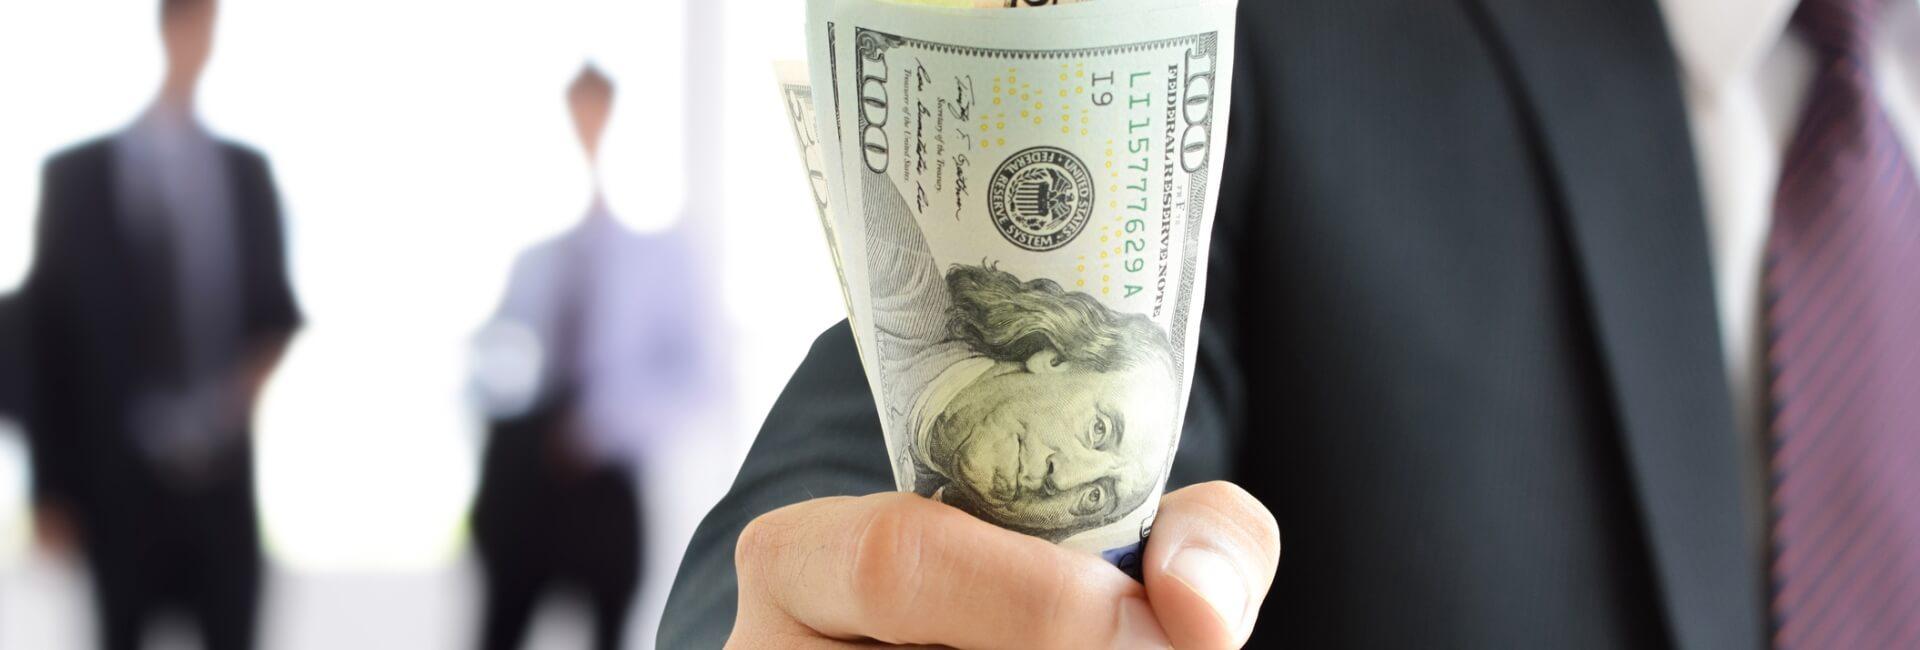 Howell Tax Service Slide 1